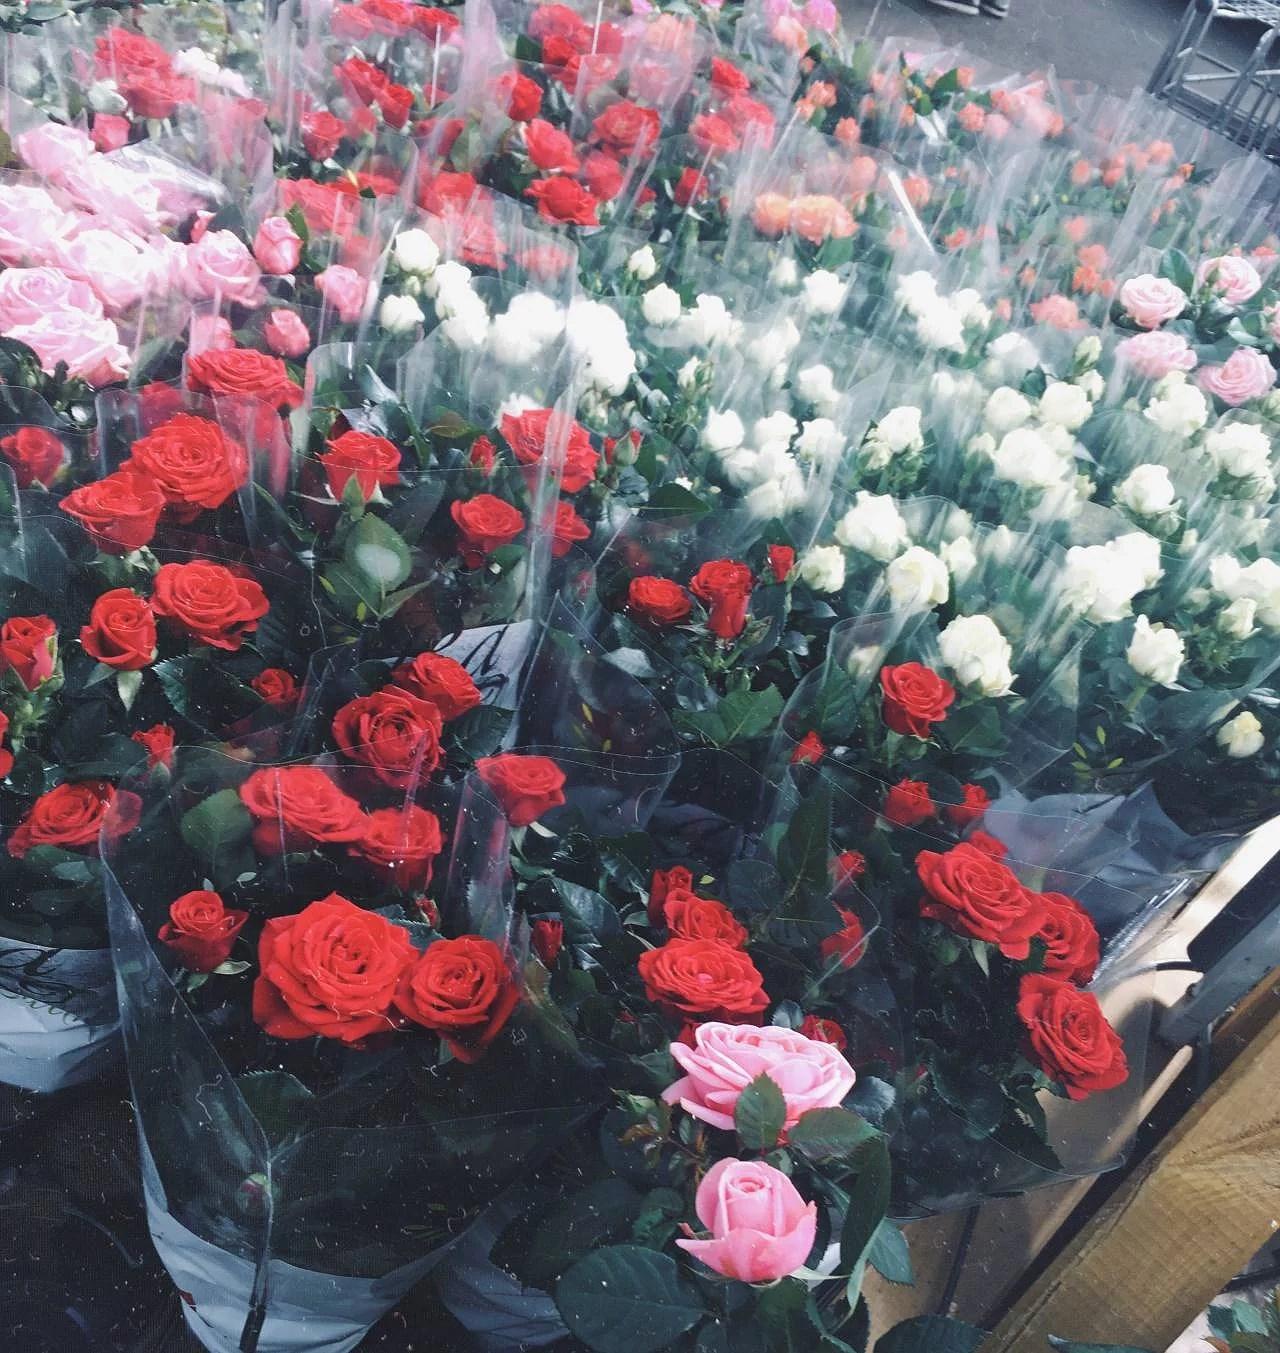 Flowers through my phone